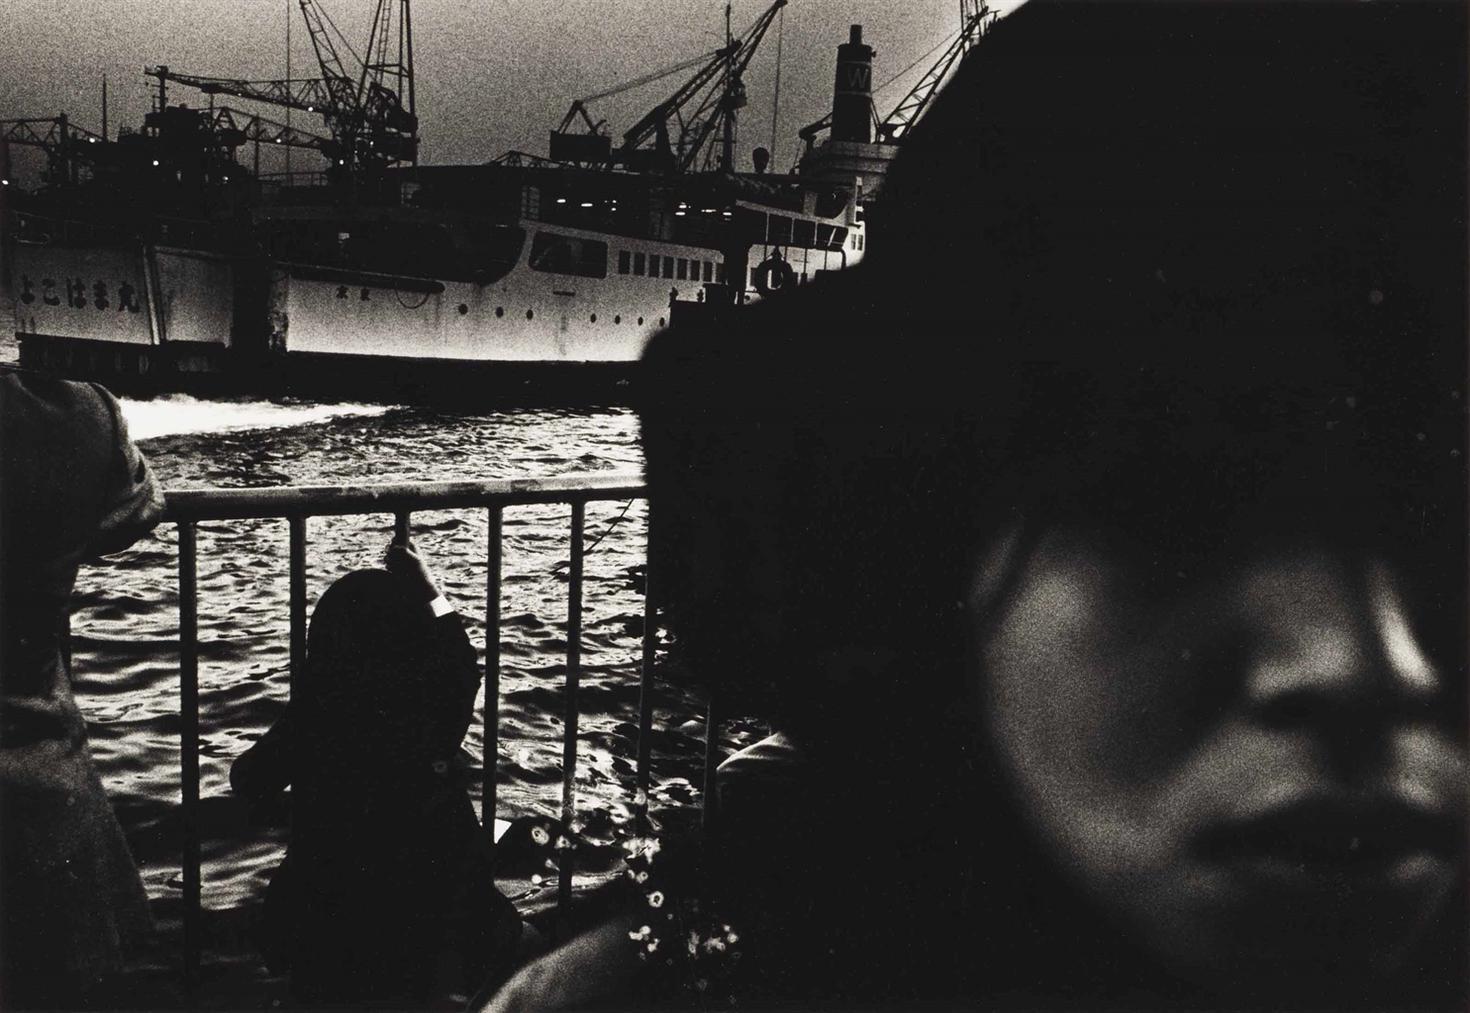 Daido Moriyama-Port With Ship, From Hunter-1972